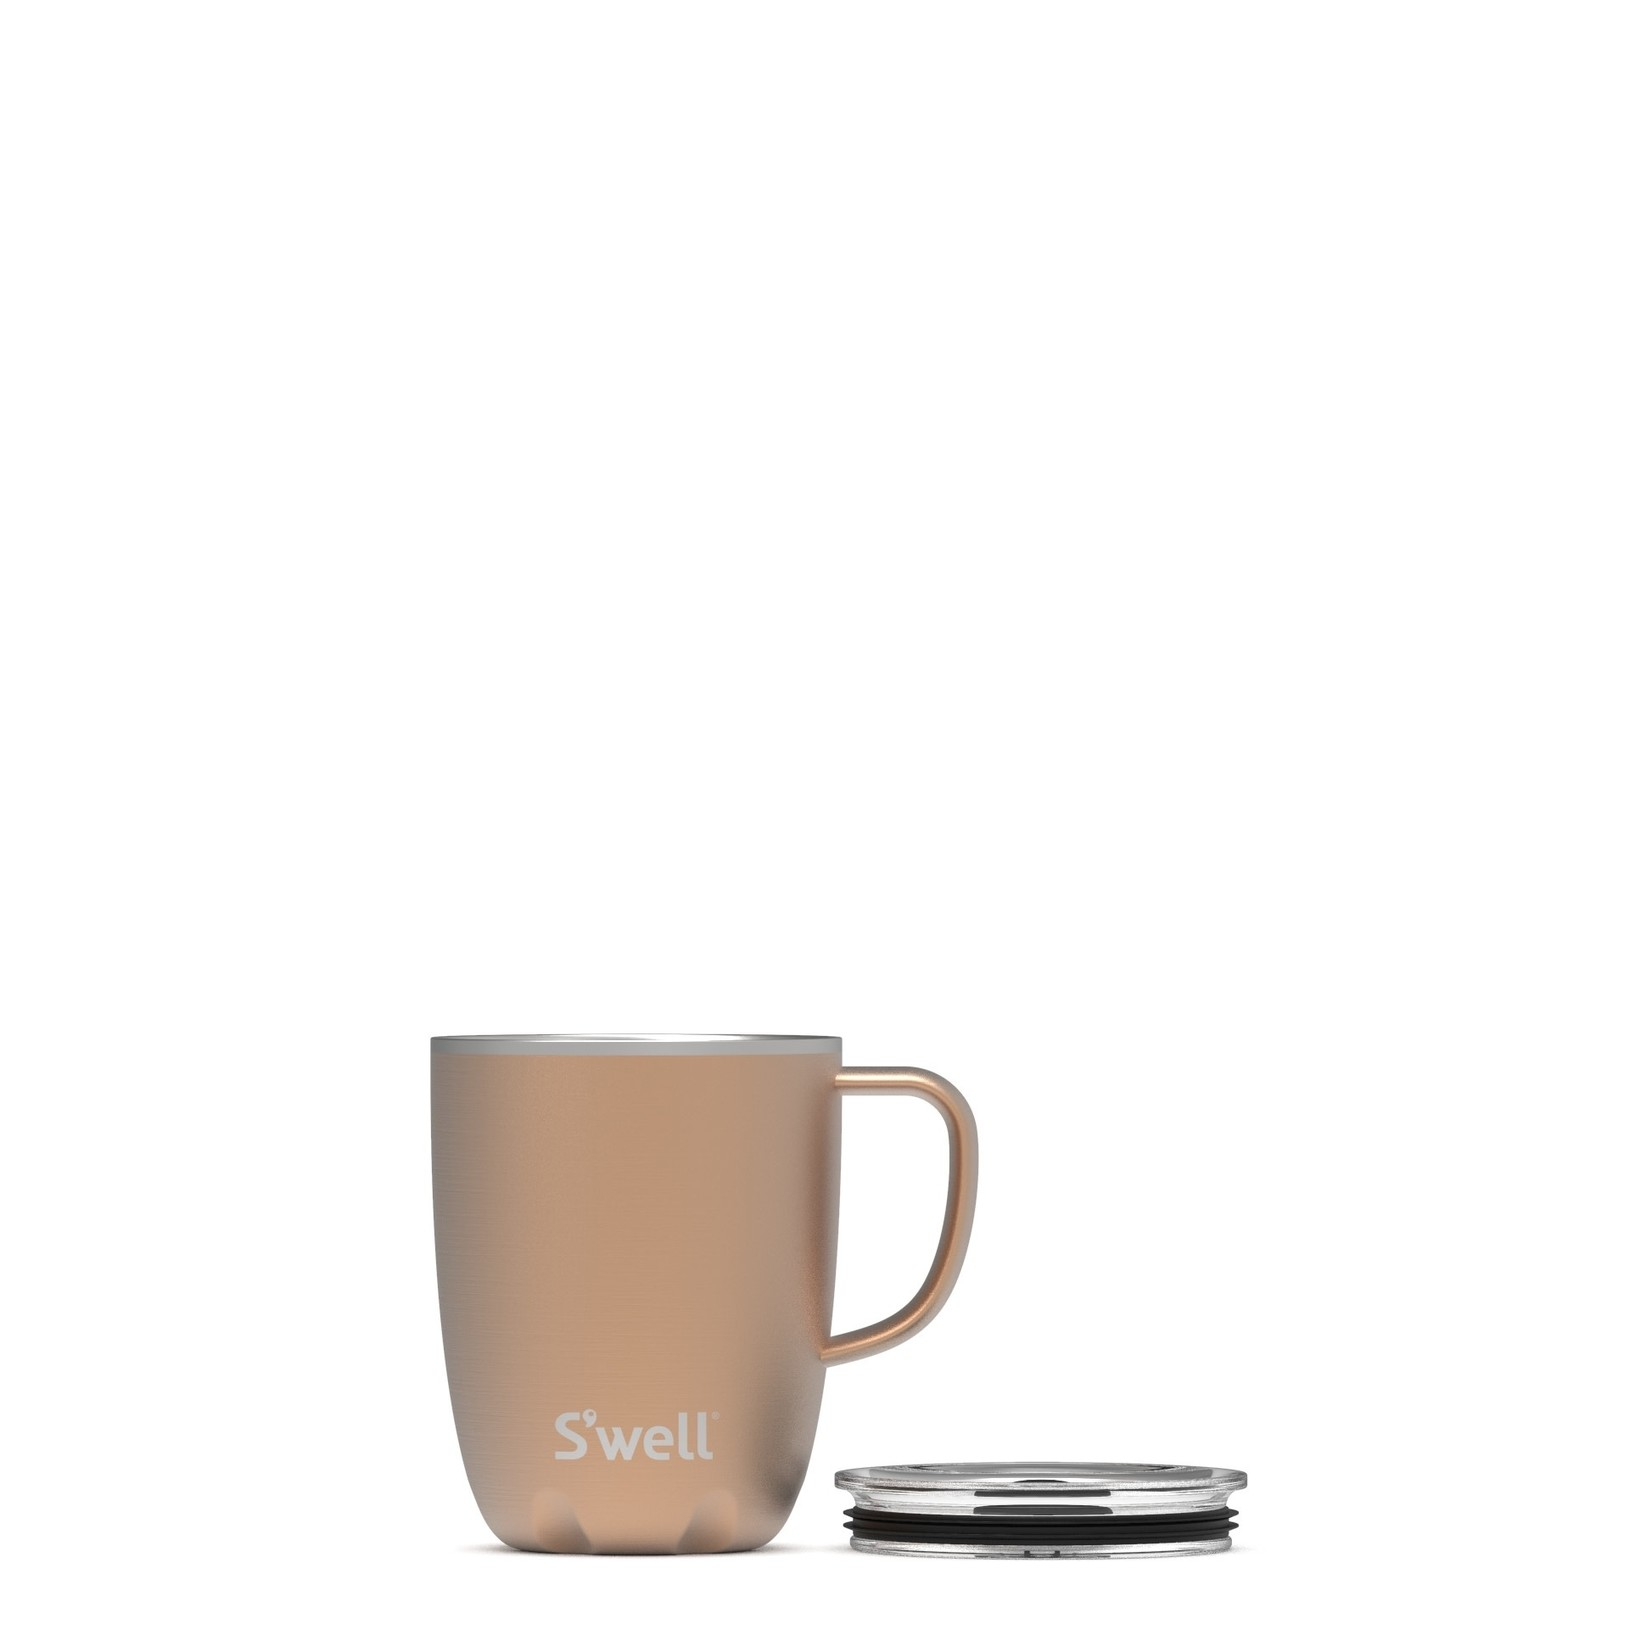 S'well S'well Bottle 12oz Tumbler Mug with Handle/Lid Pyrite